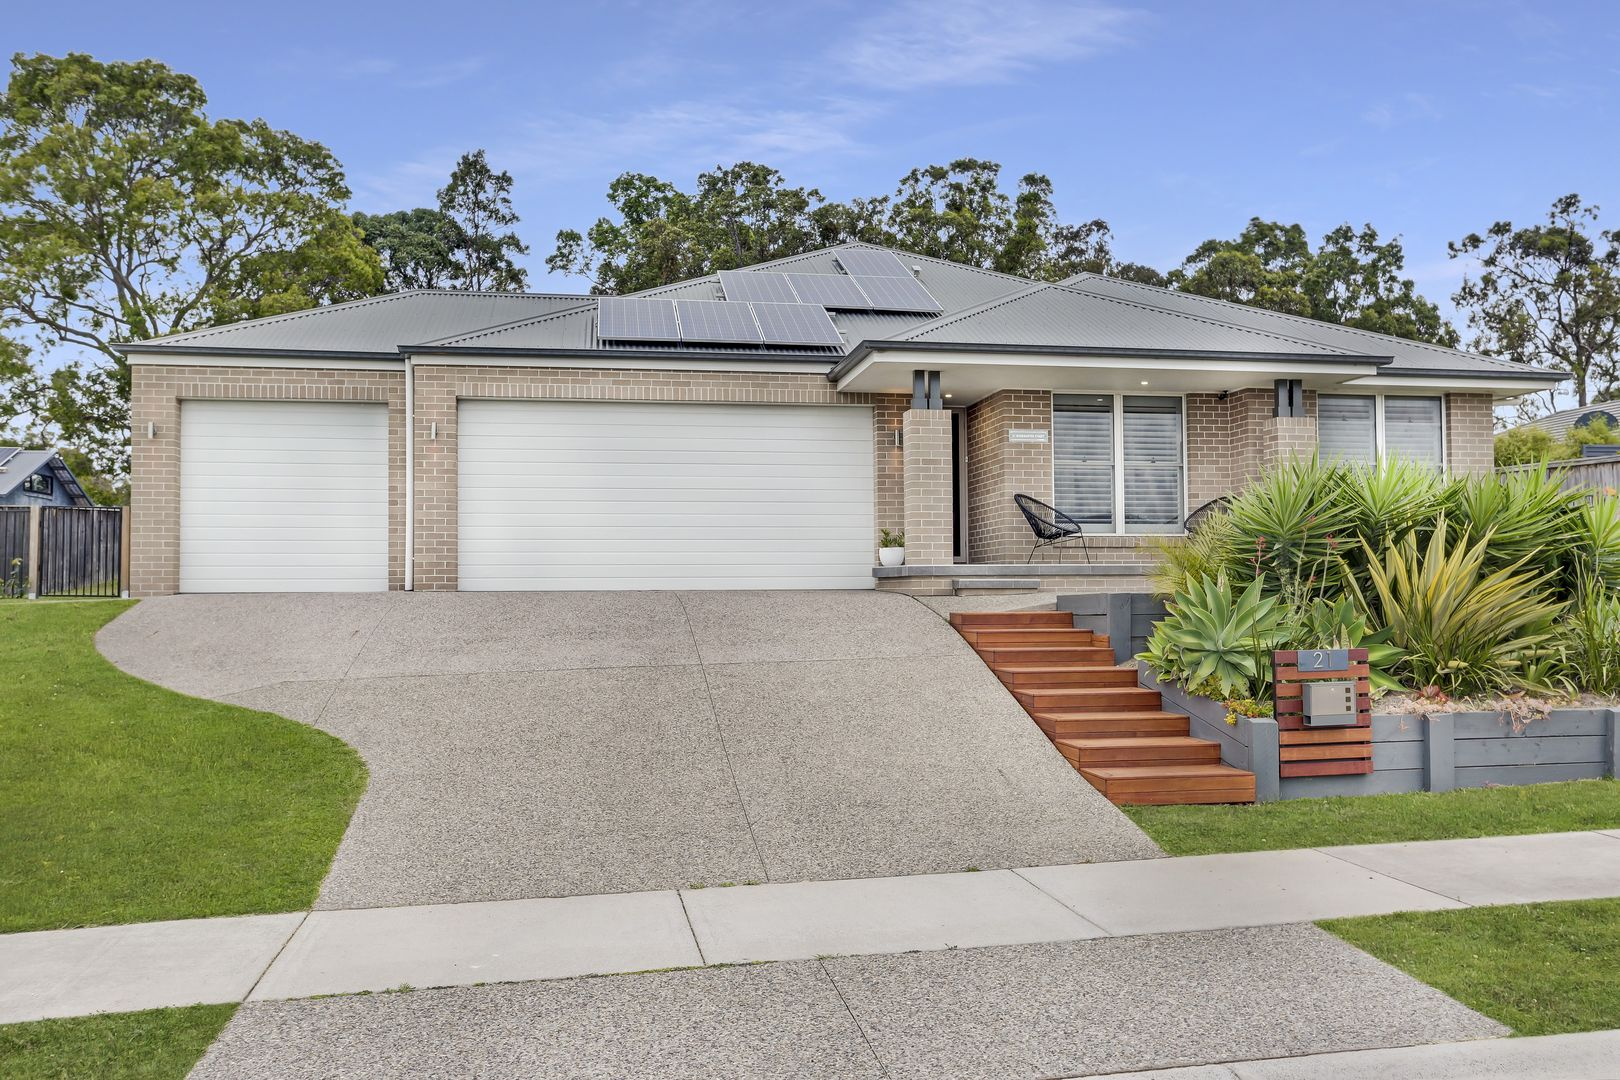 21 Duskdarter Street, Chisholm NSW 2322, Image 0